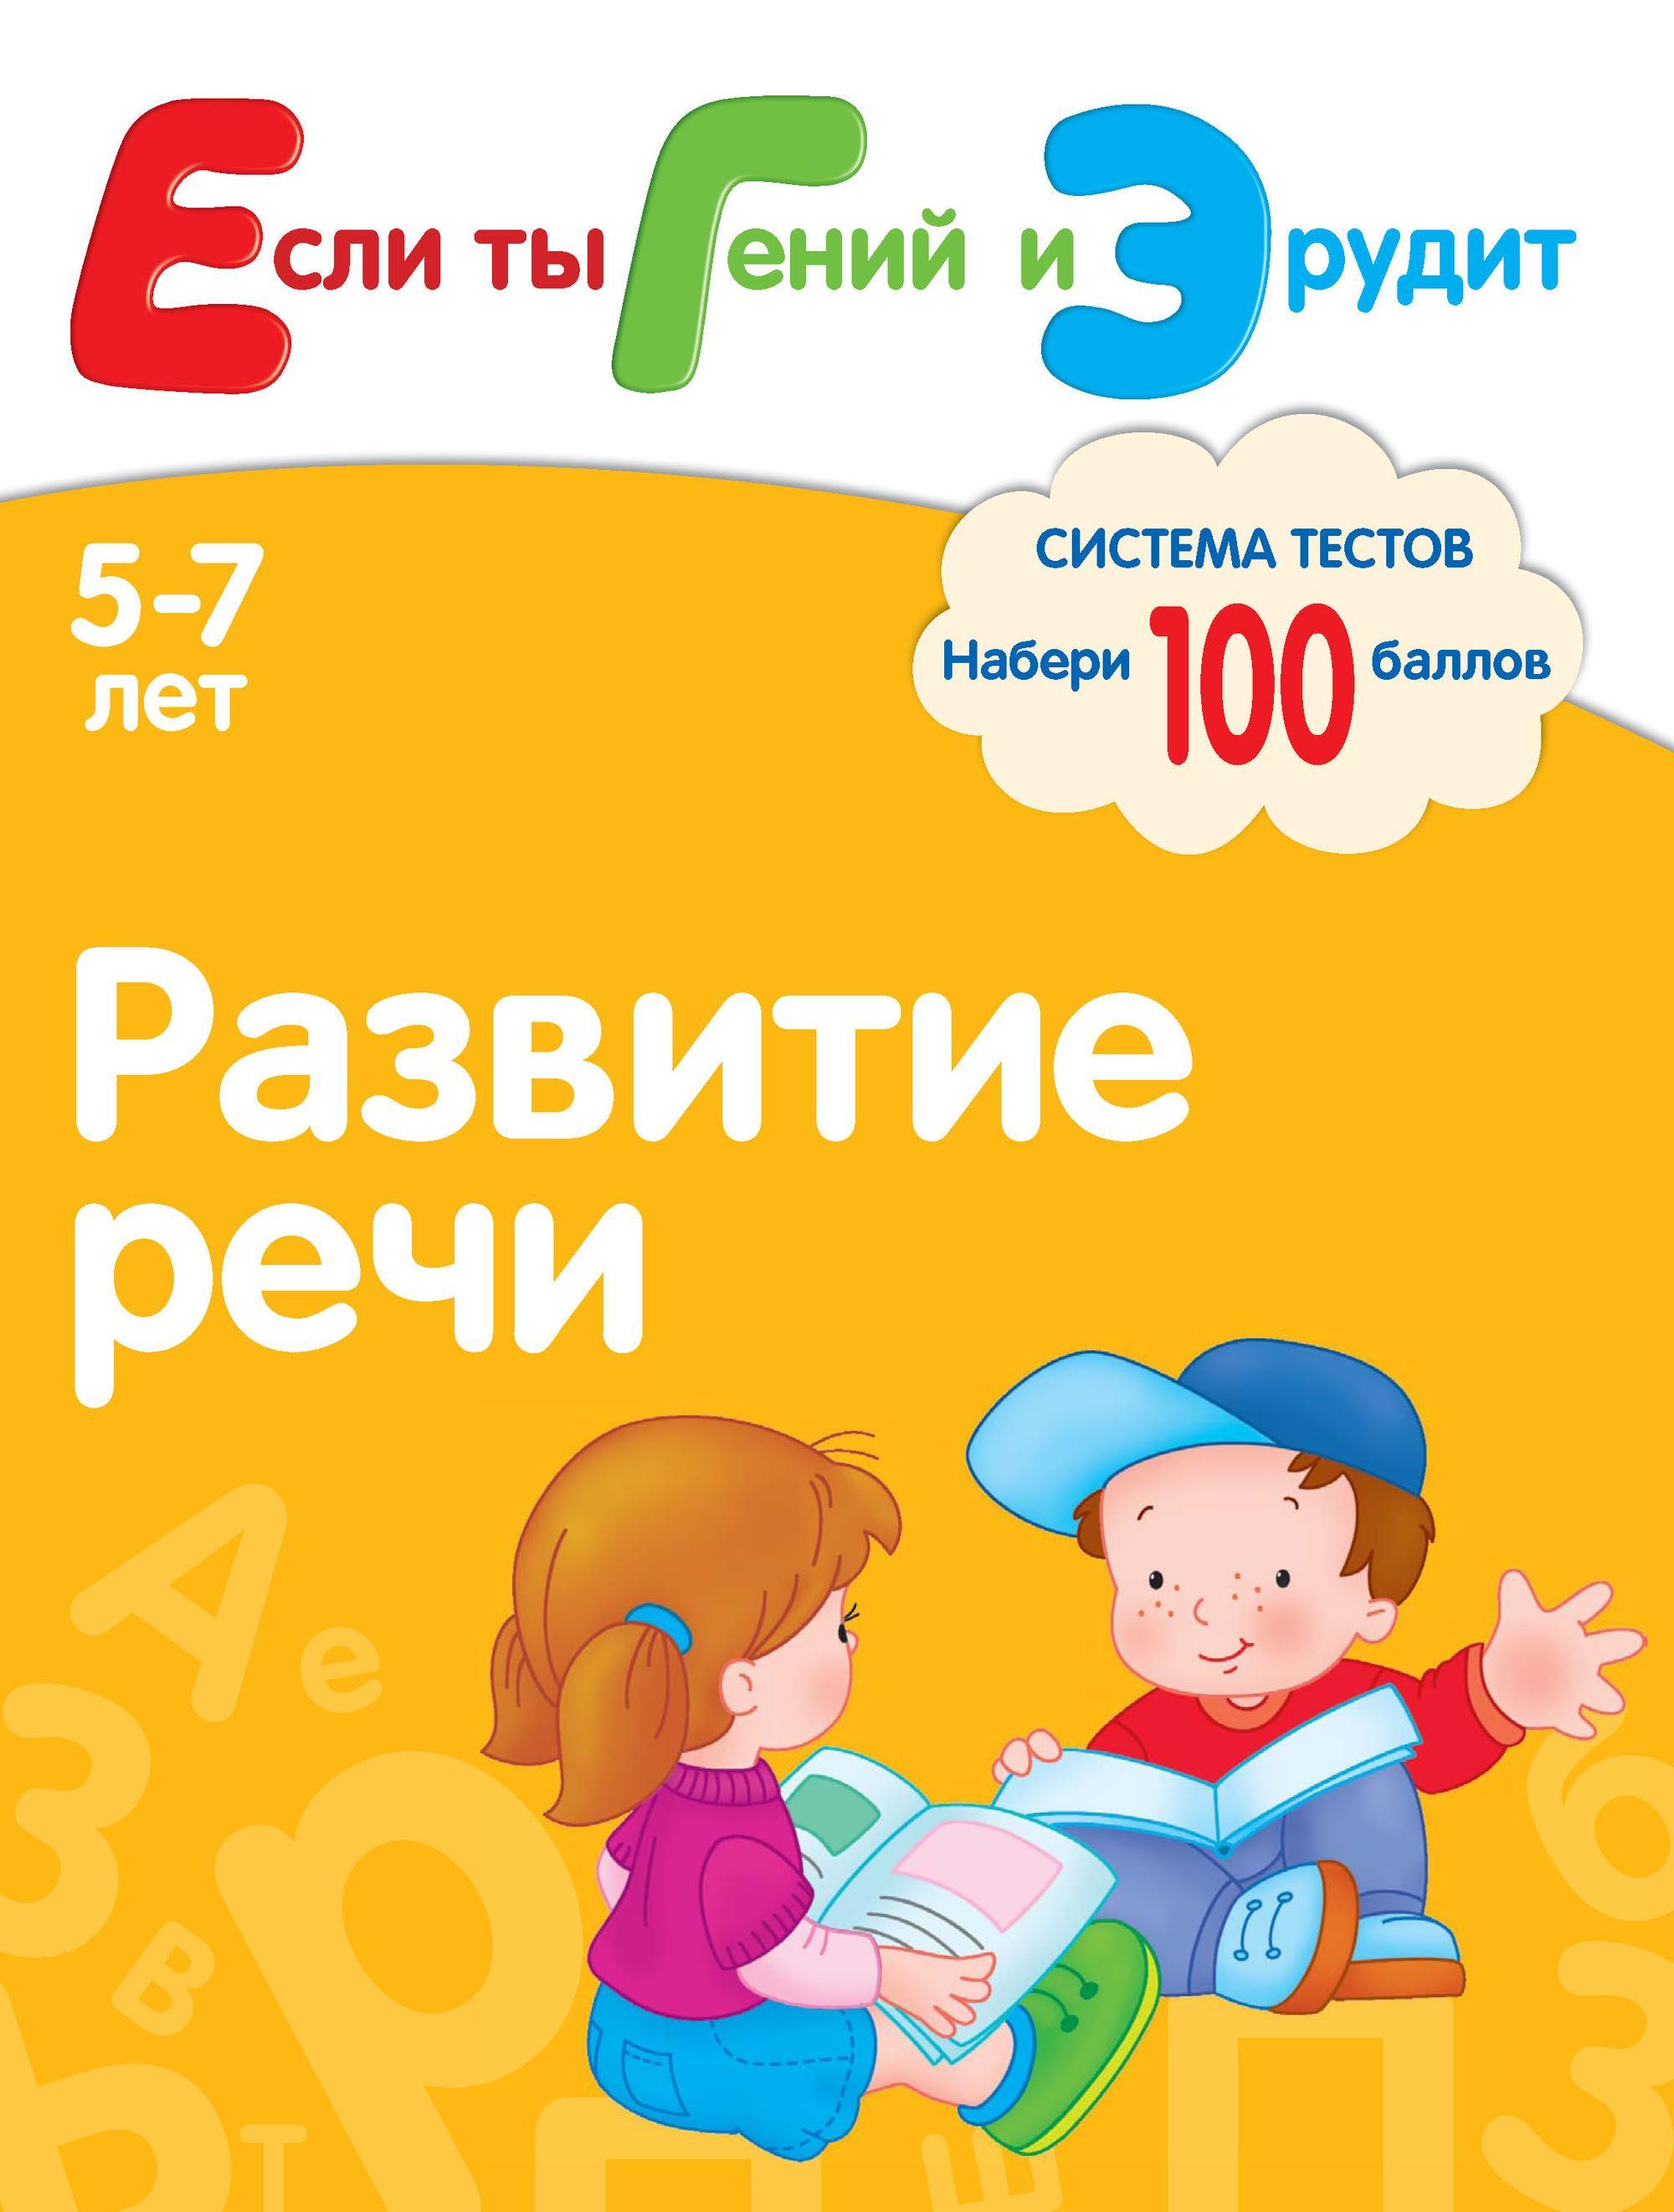 С. Е. Гаврина Развитие речи. Система тестов для детей 5-7 лет с е гаврина математика система тестов для детей 5 7 лет